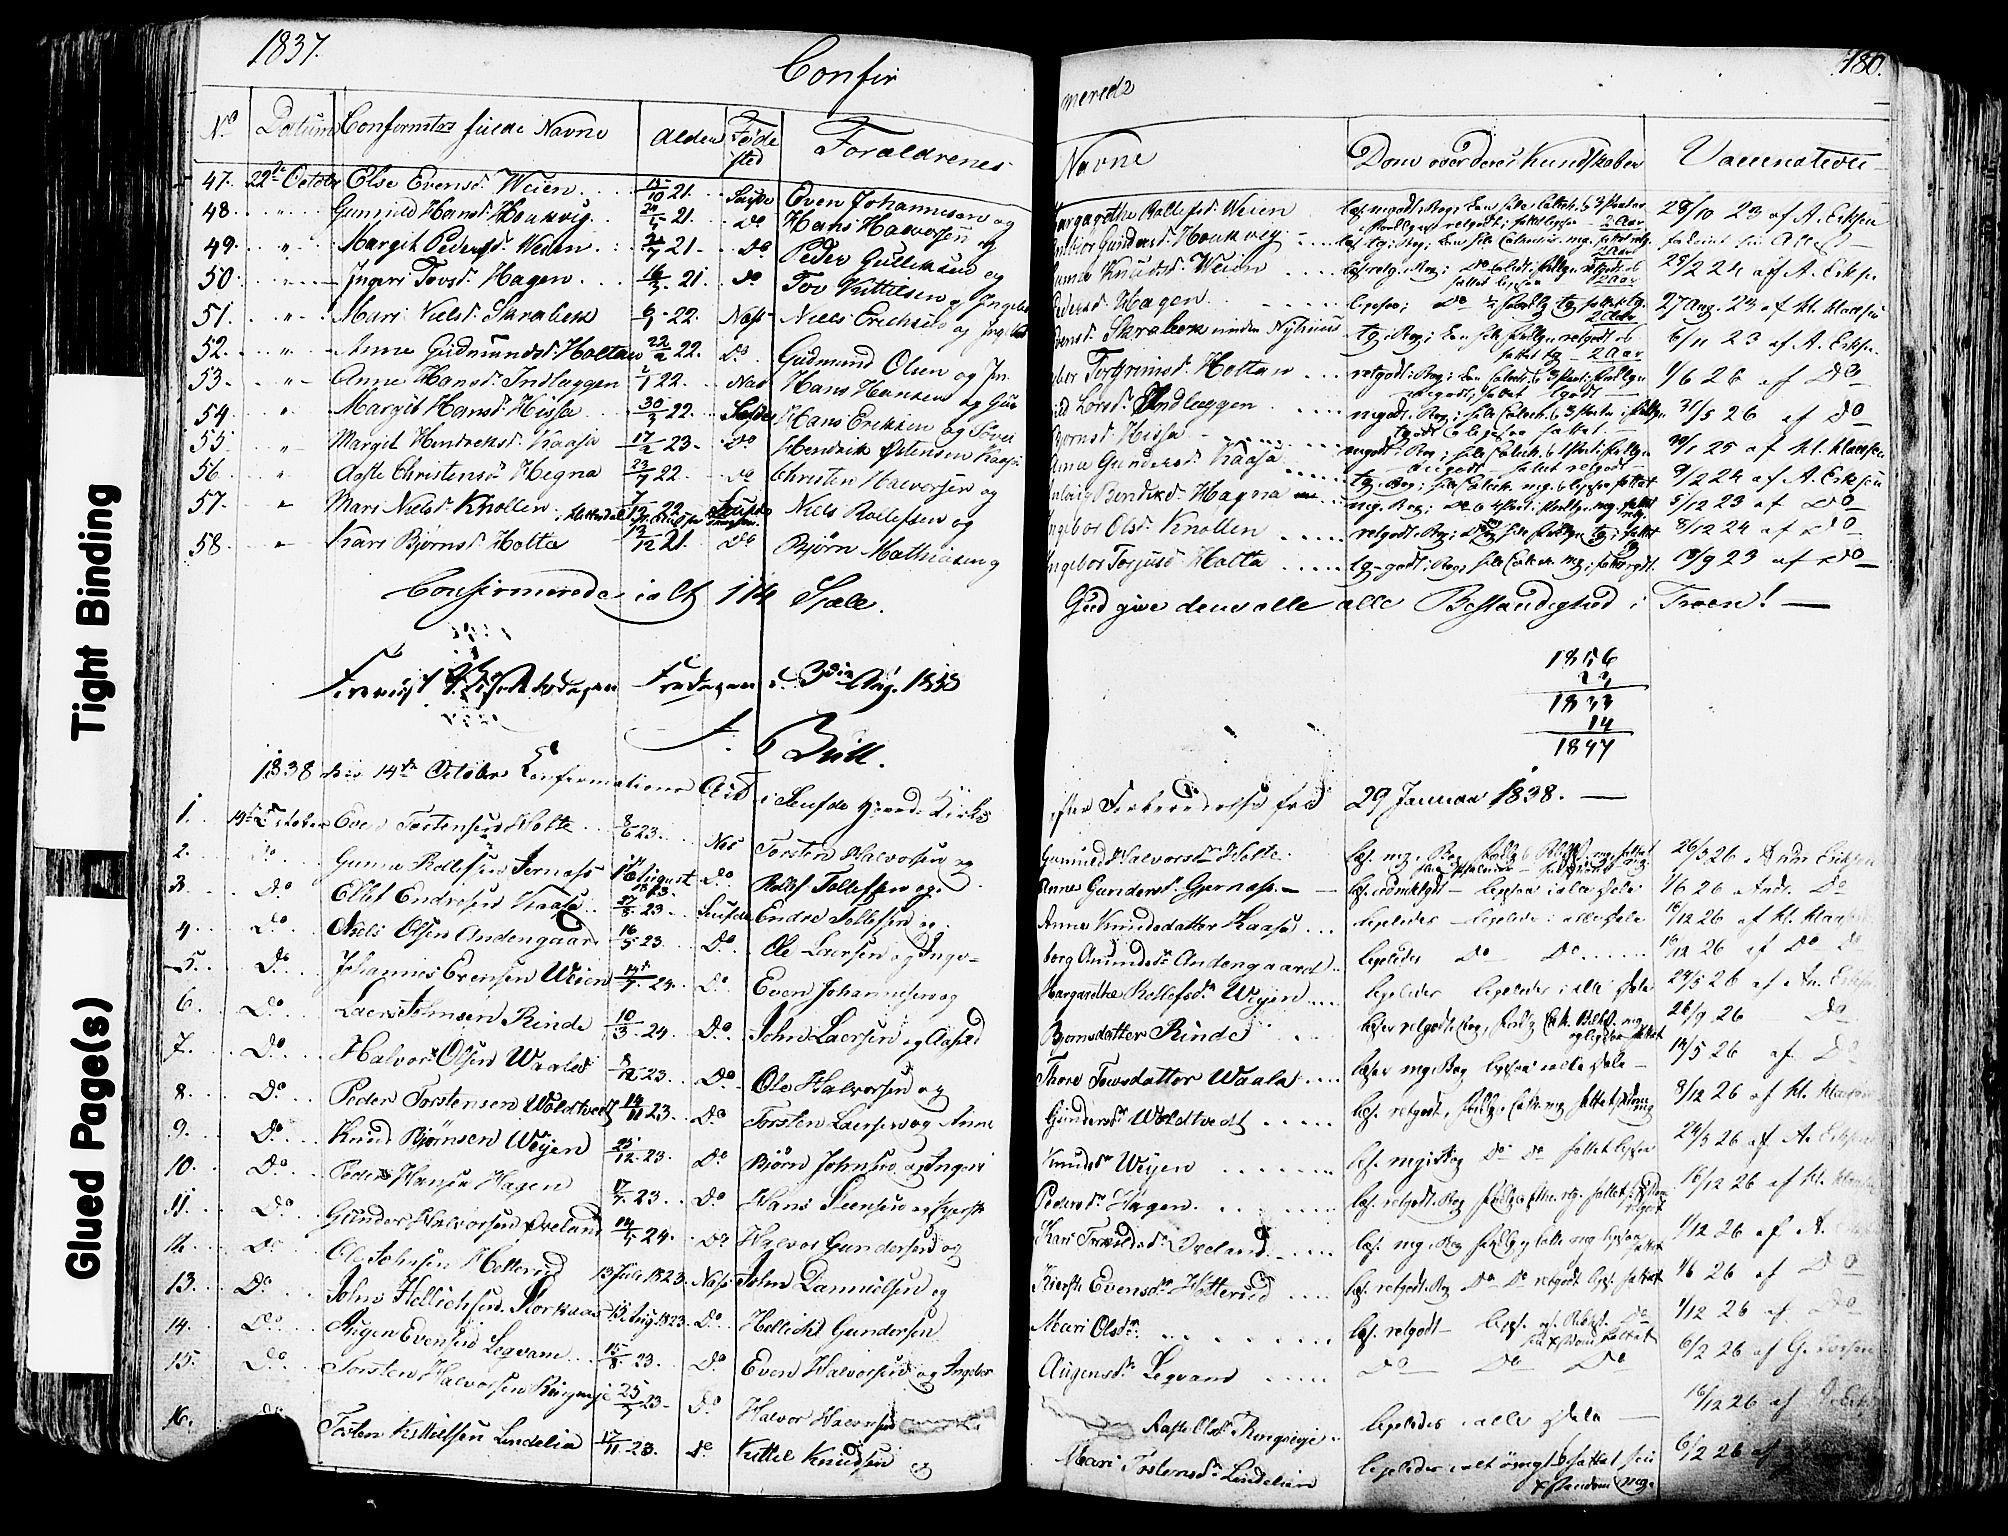 SAKO, Sauherad kirkebøker, F/Fa/L0006: Ministerialbok nr. I 6, 1827-1850, s. 180